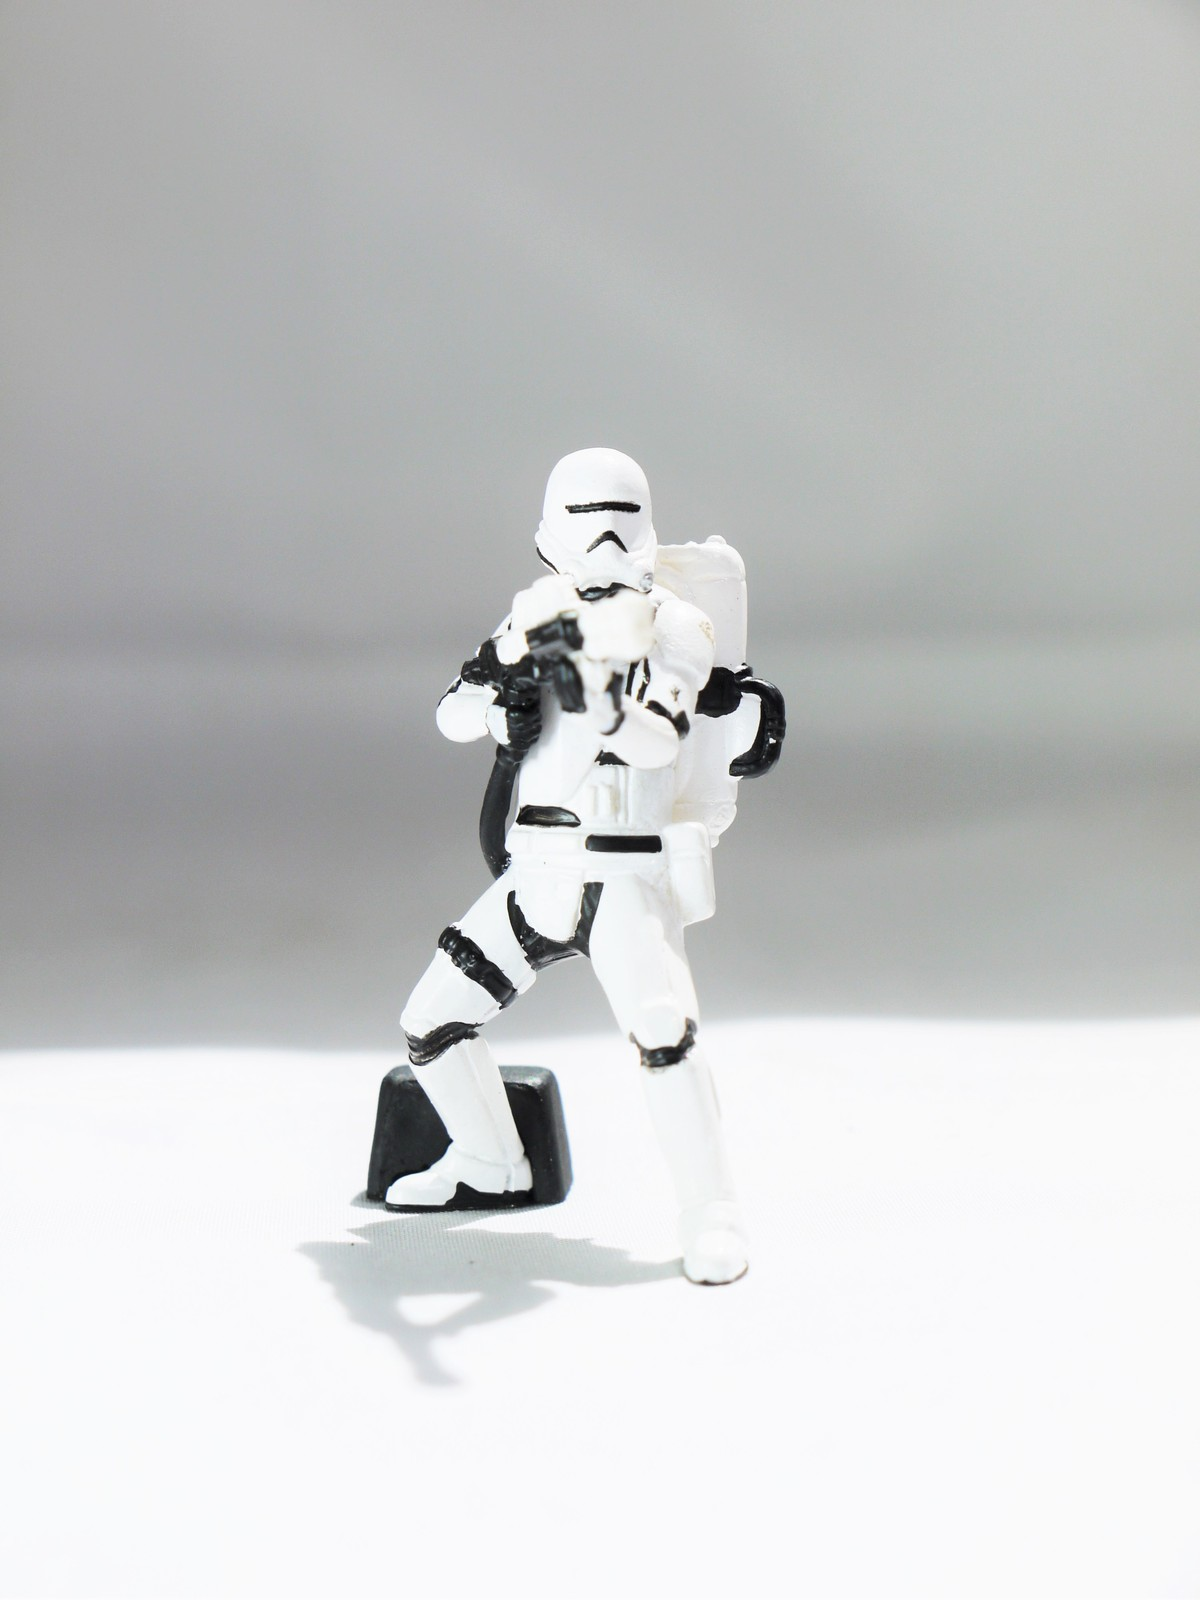 Arts star wars char gacha galaxy desktop first order p2   flametrooper   01